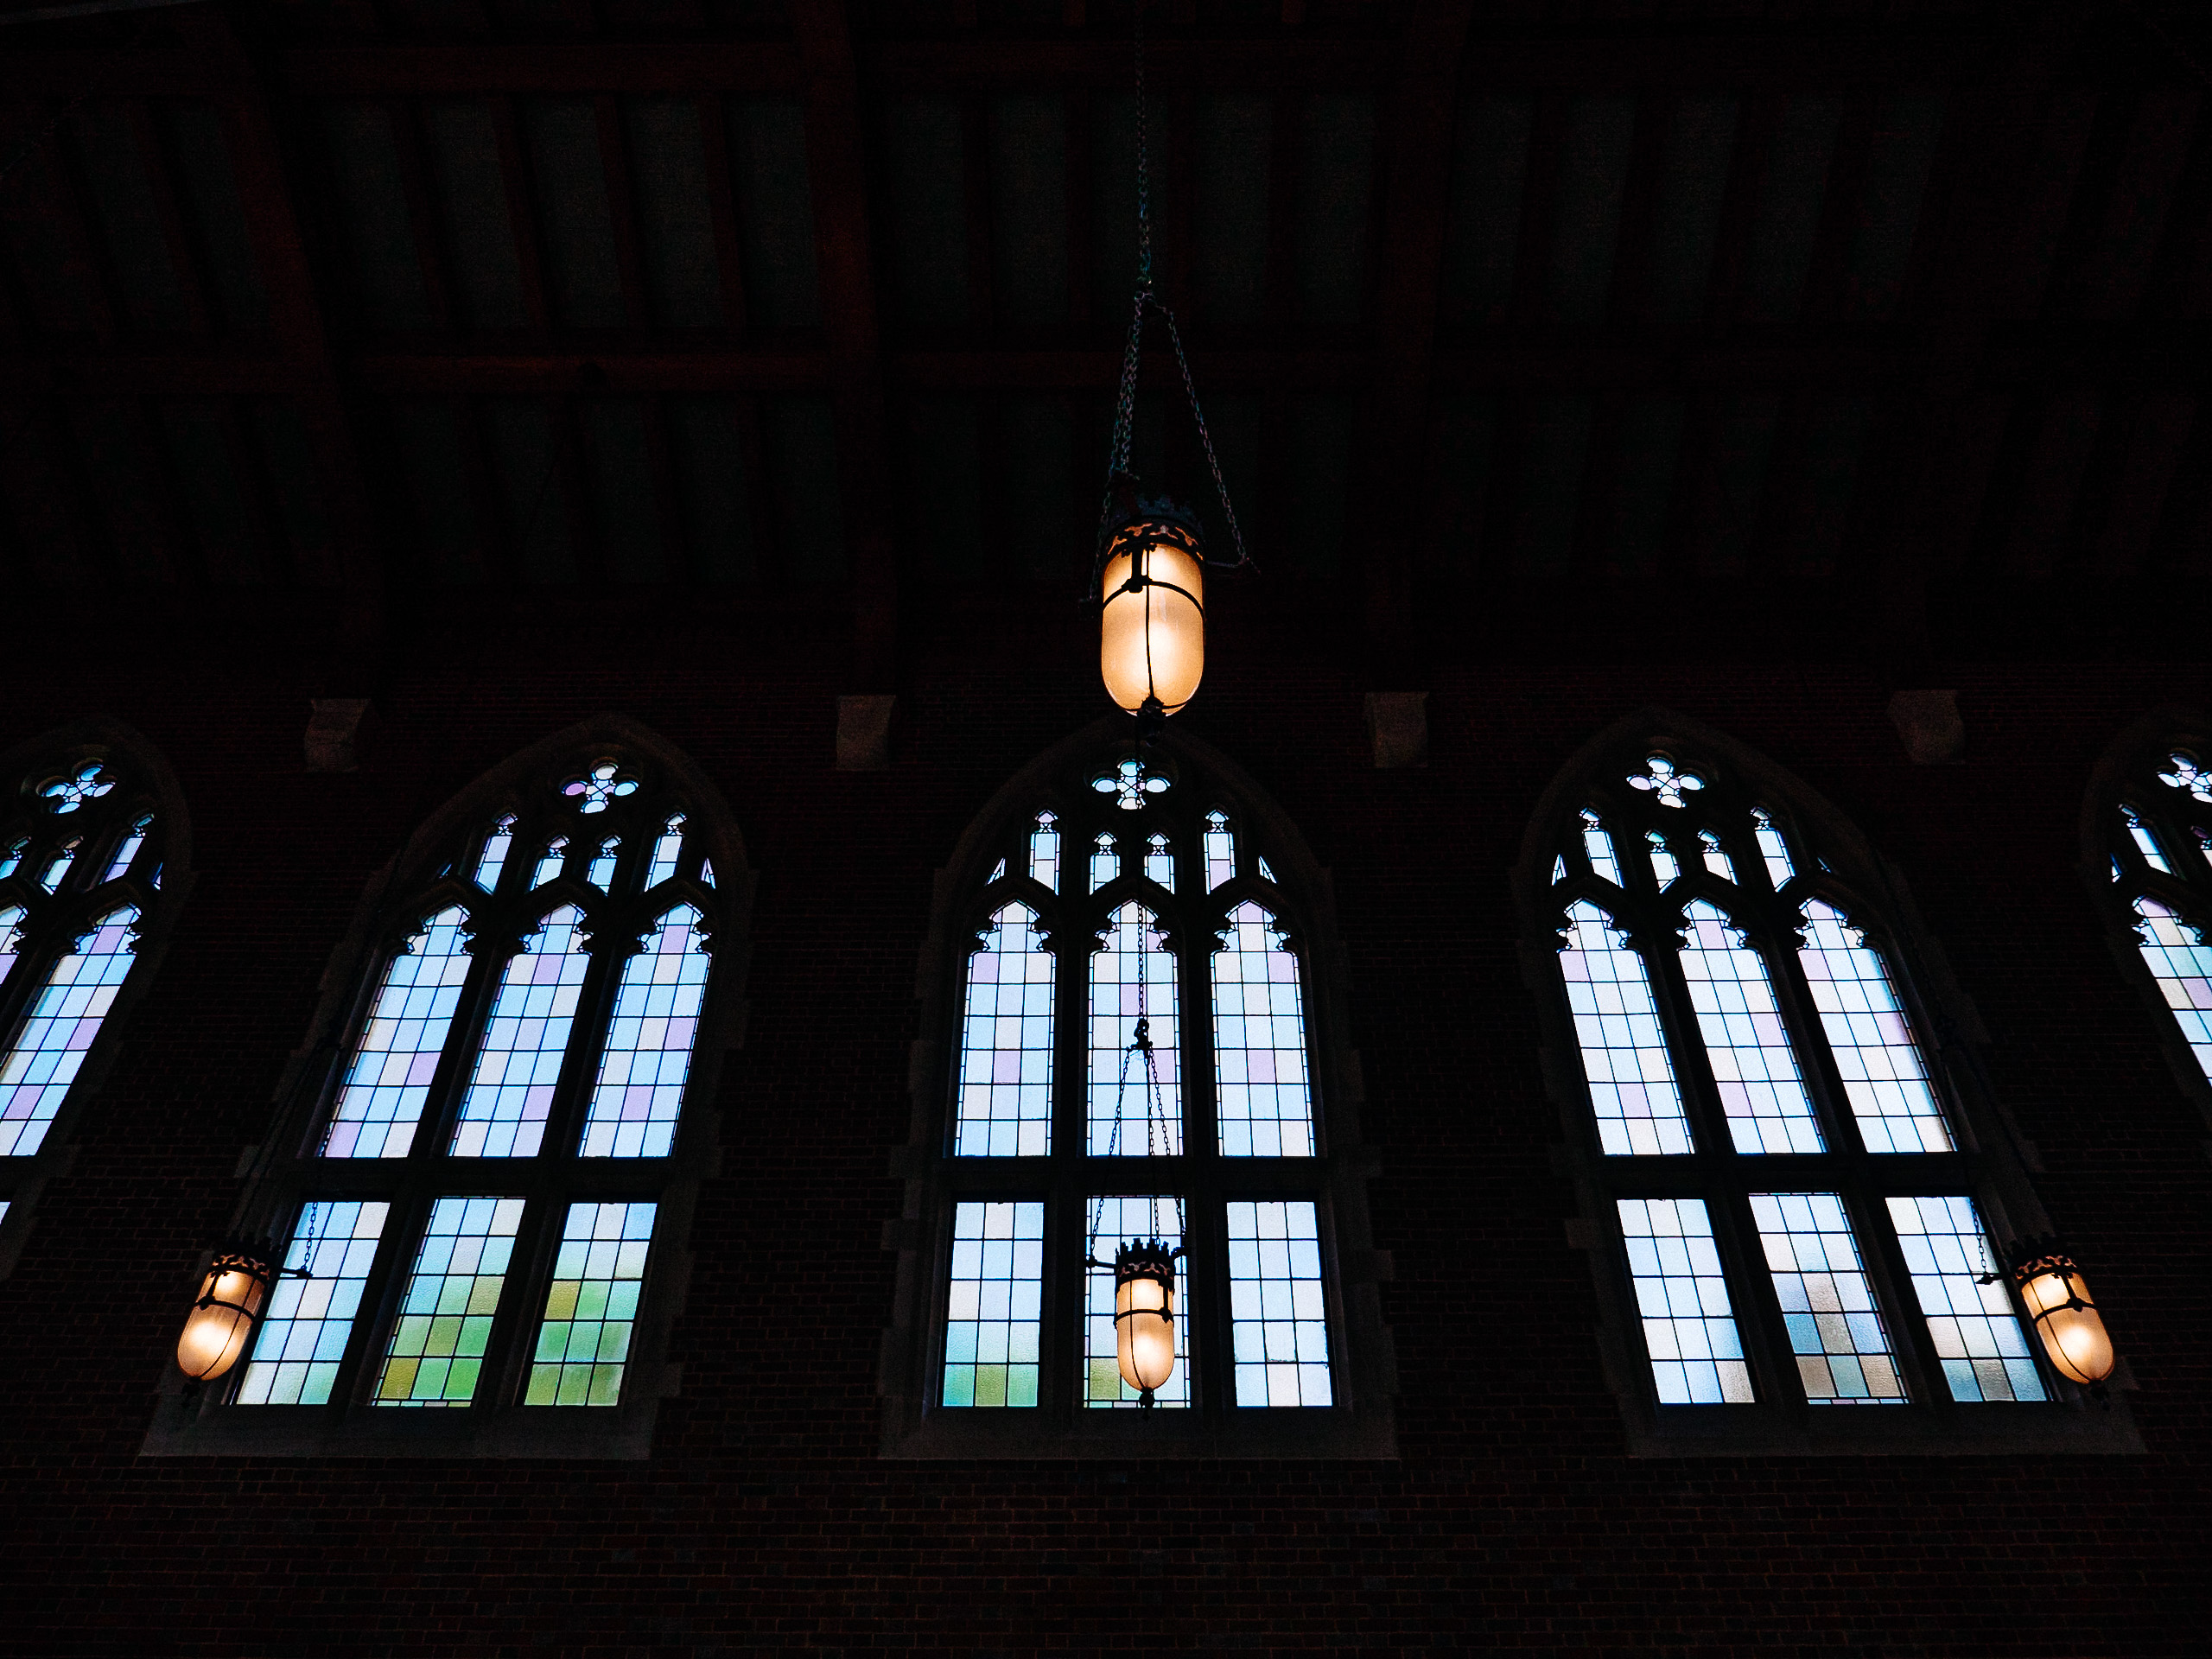 wightman-chapel-stained-glass-windows